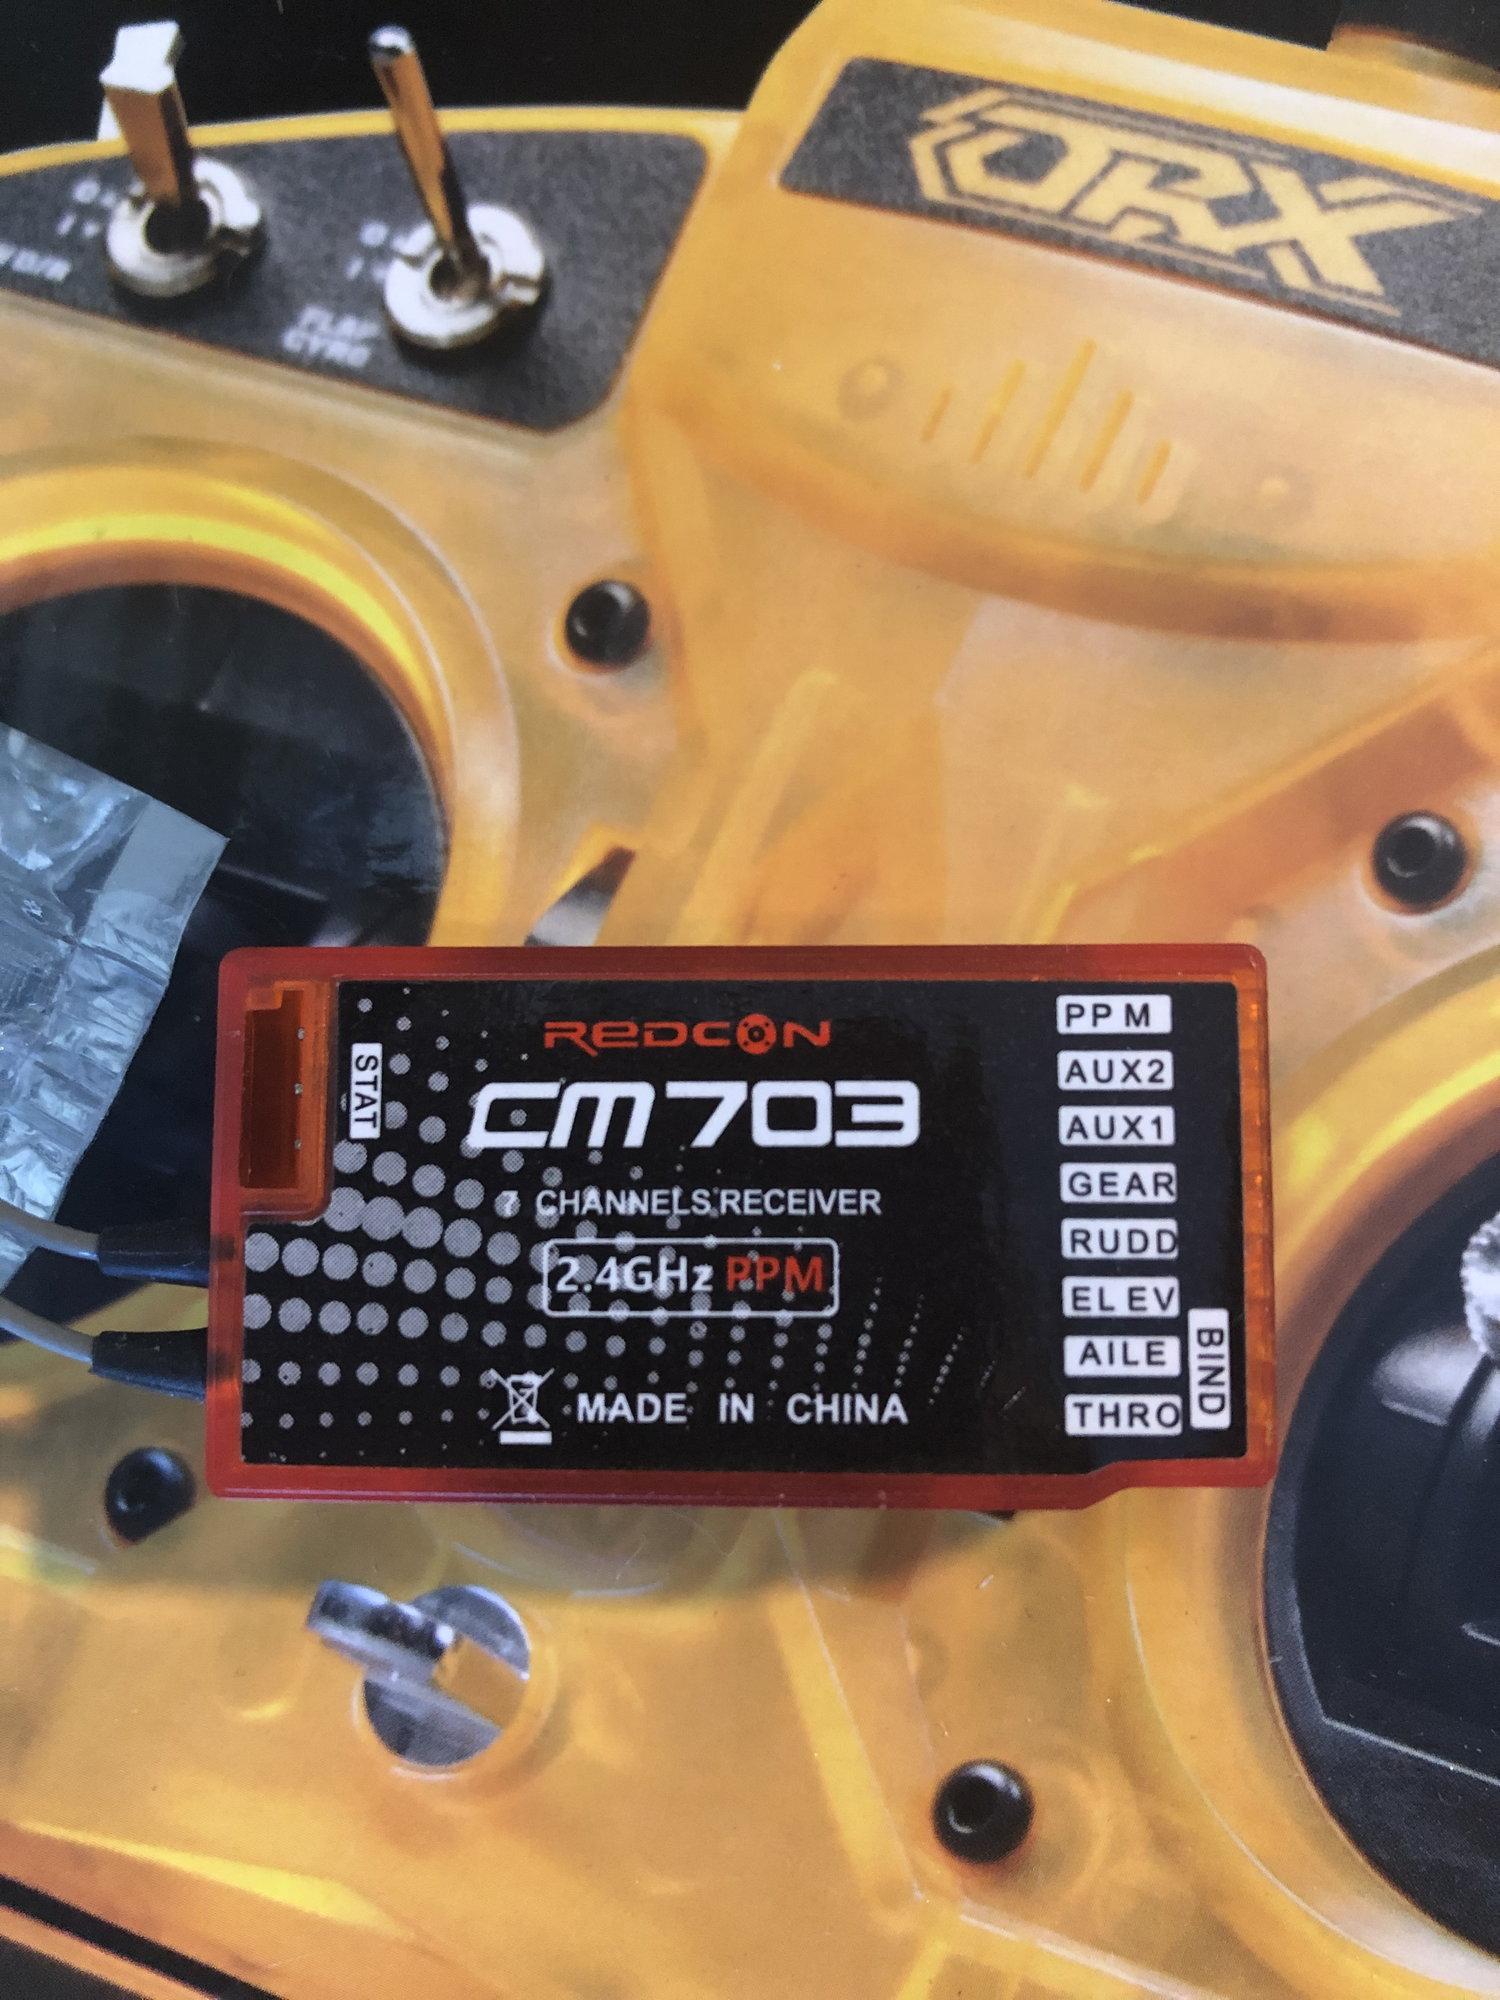 OrangeRx 6ch dsm2 transmitter & Redcon cm703 7ch dsmx receiver - RCU